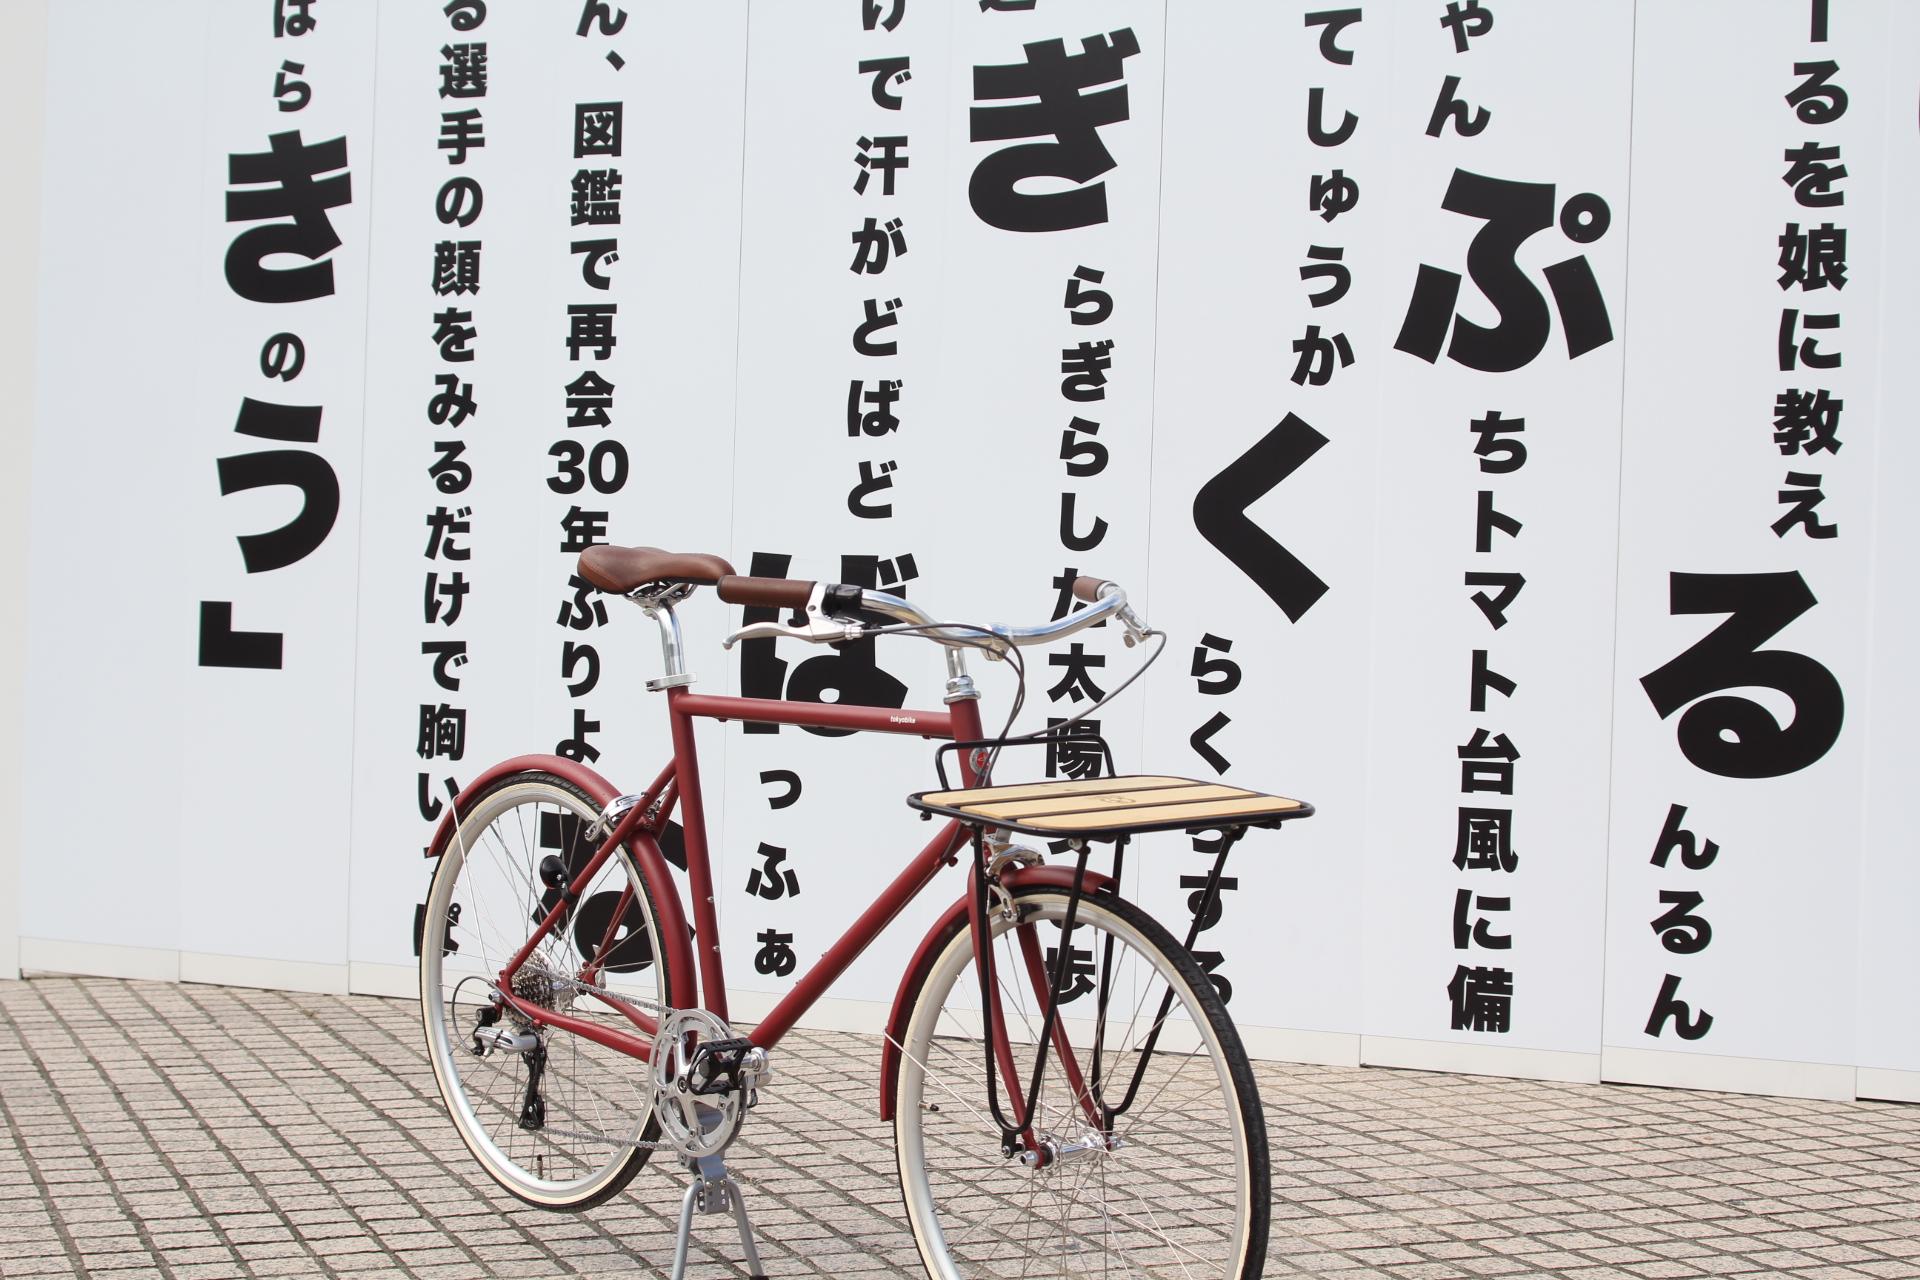 tokyobike『26』よりゆったり乗れる感じにカスタム